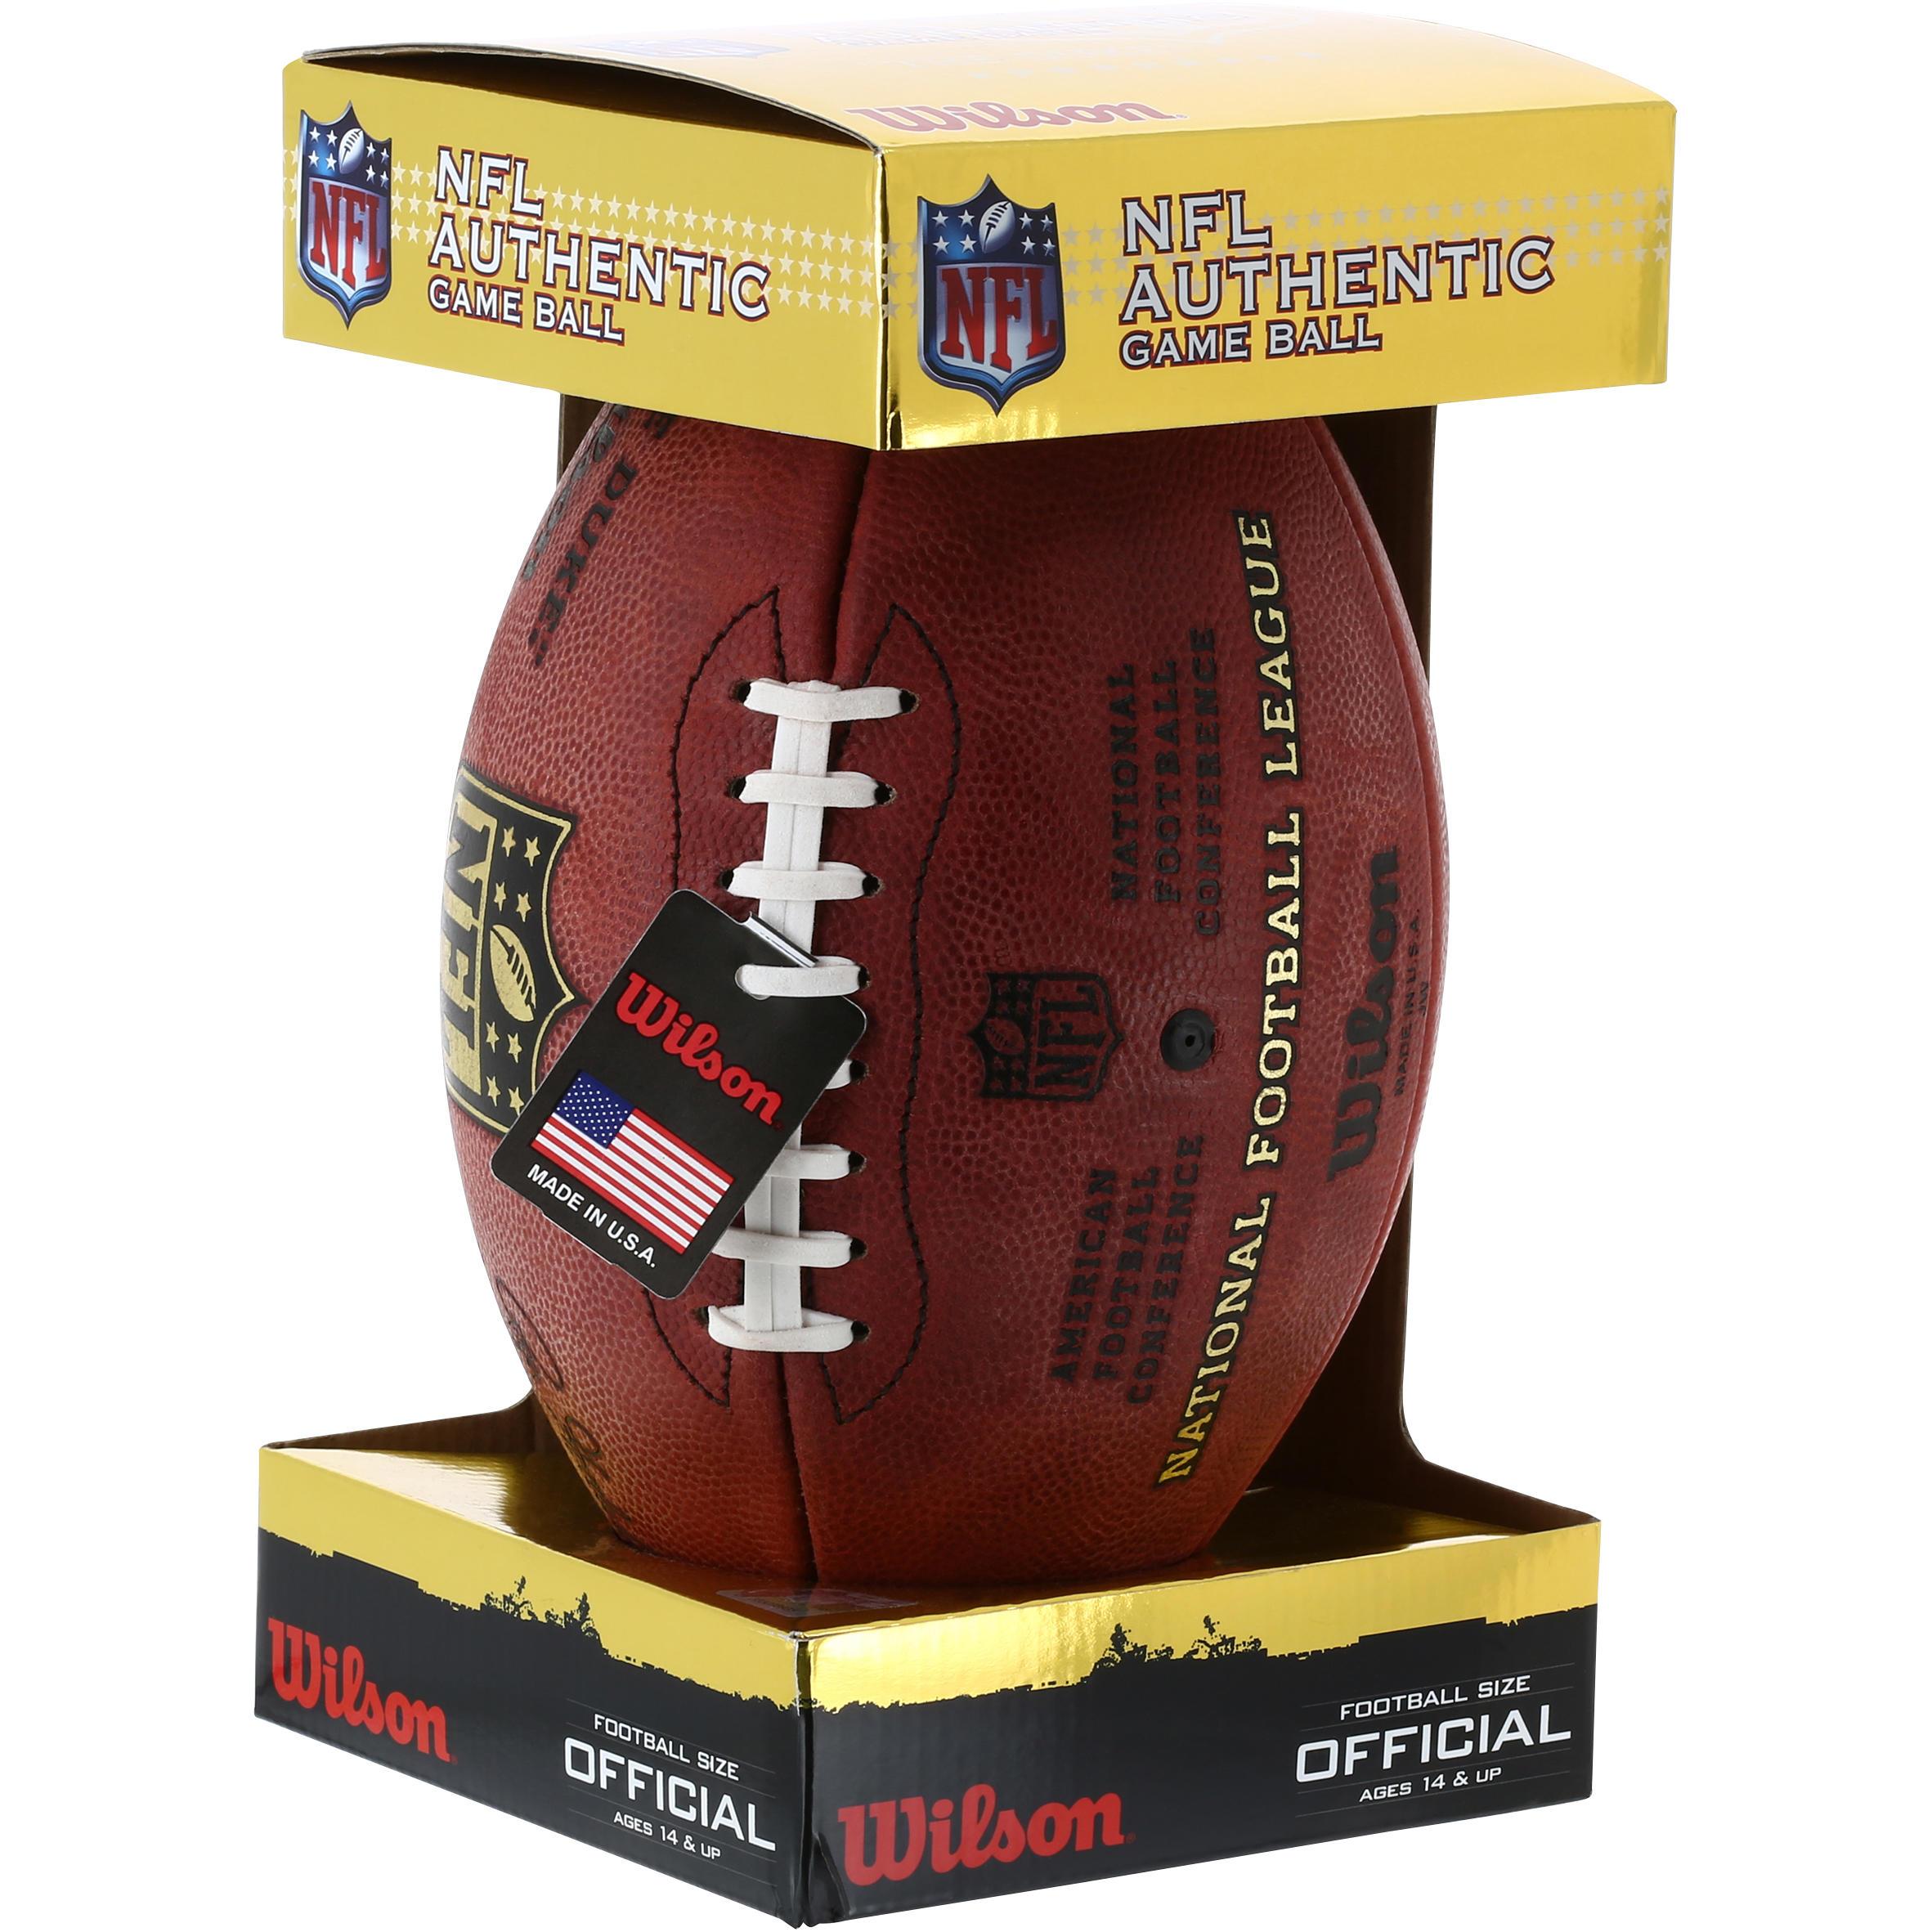 Minge NFL GAME BALL DUKE imagine produs